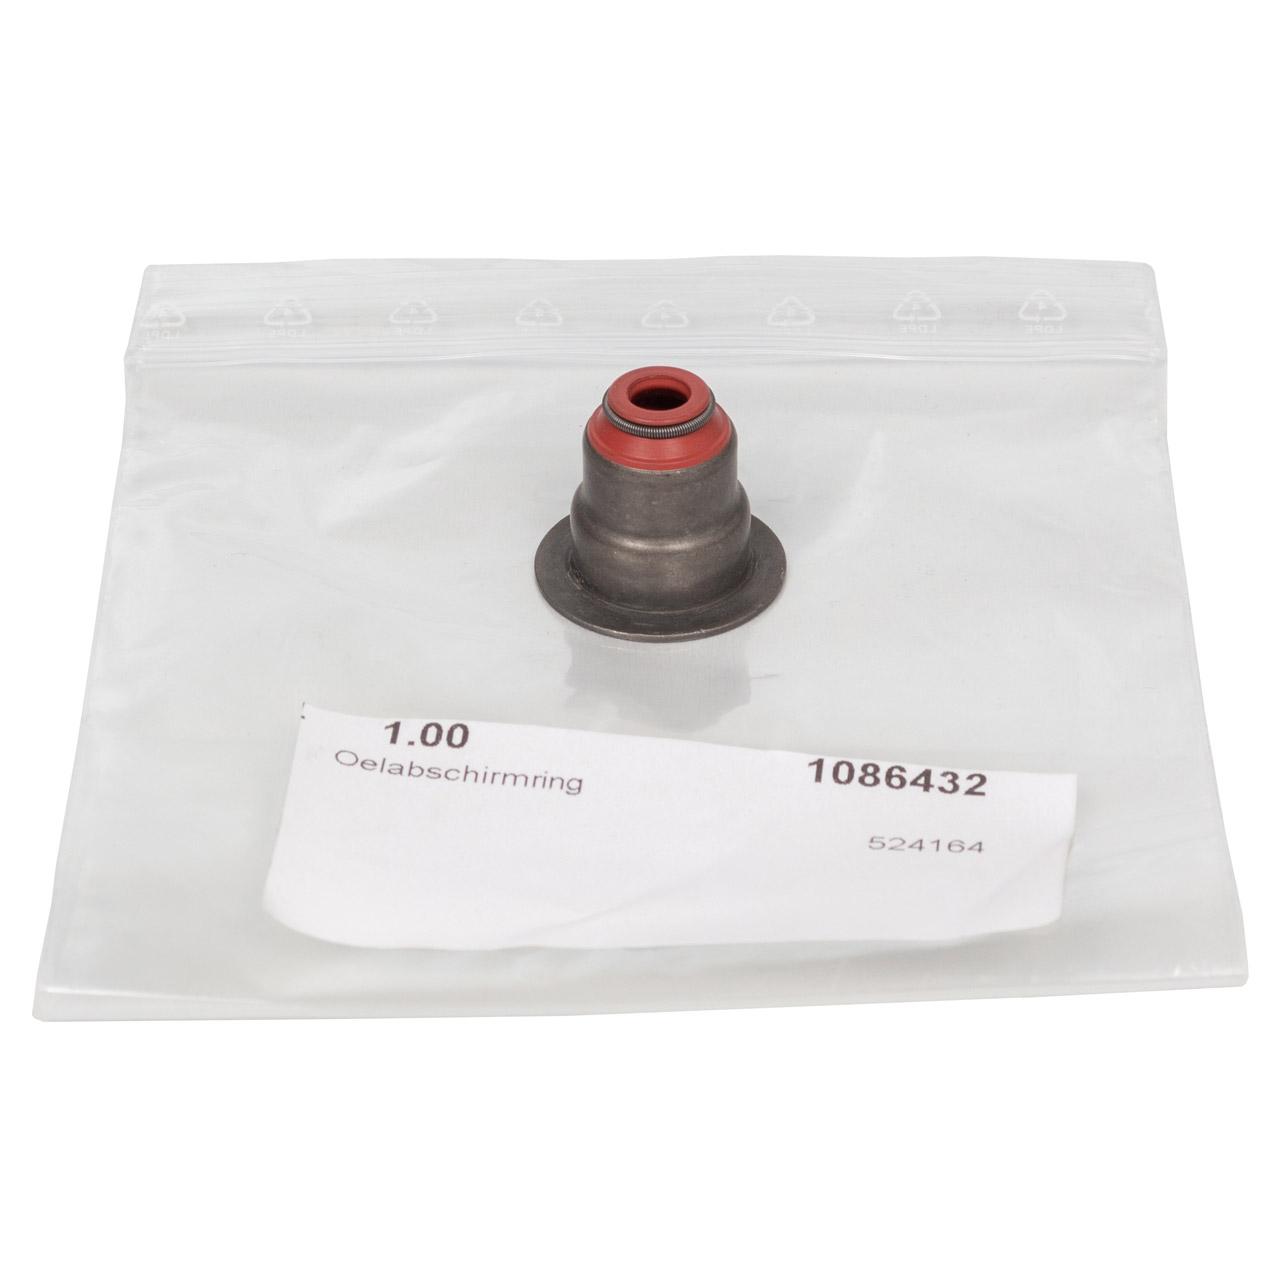 ORIGINAL Ford Ventilschaftabdichtung ESCORT FIESTA FOCUS MONDEO 1.6-2.0 1086432